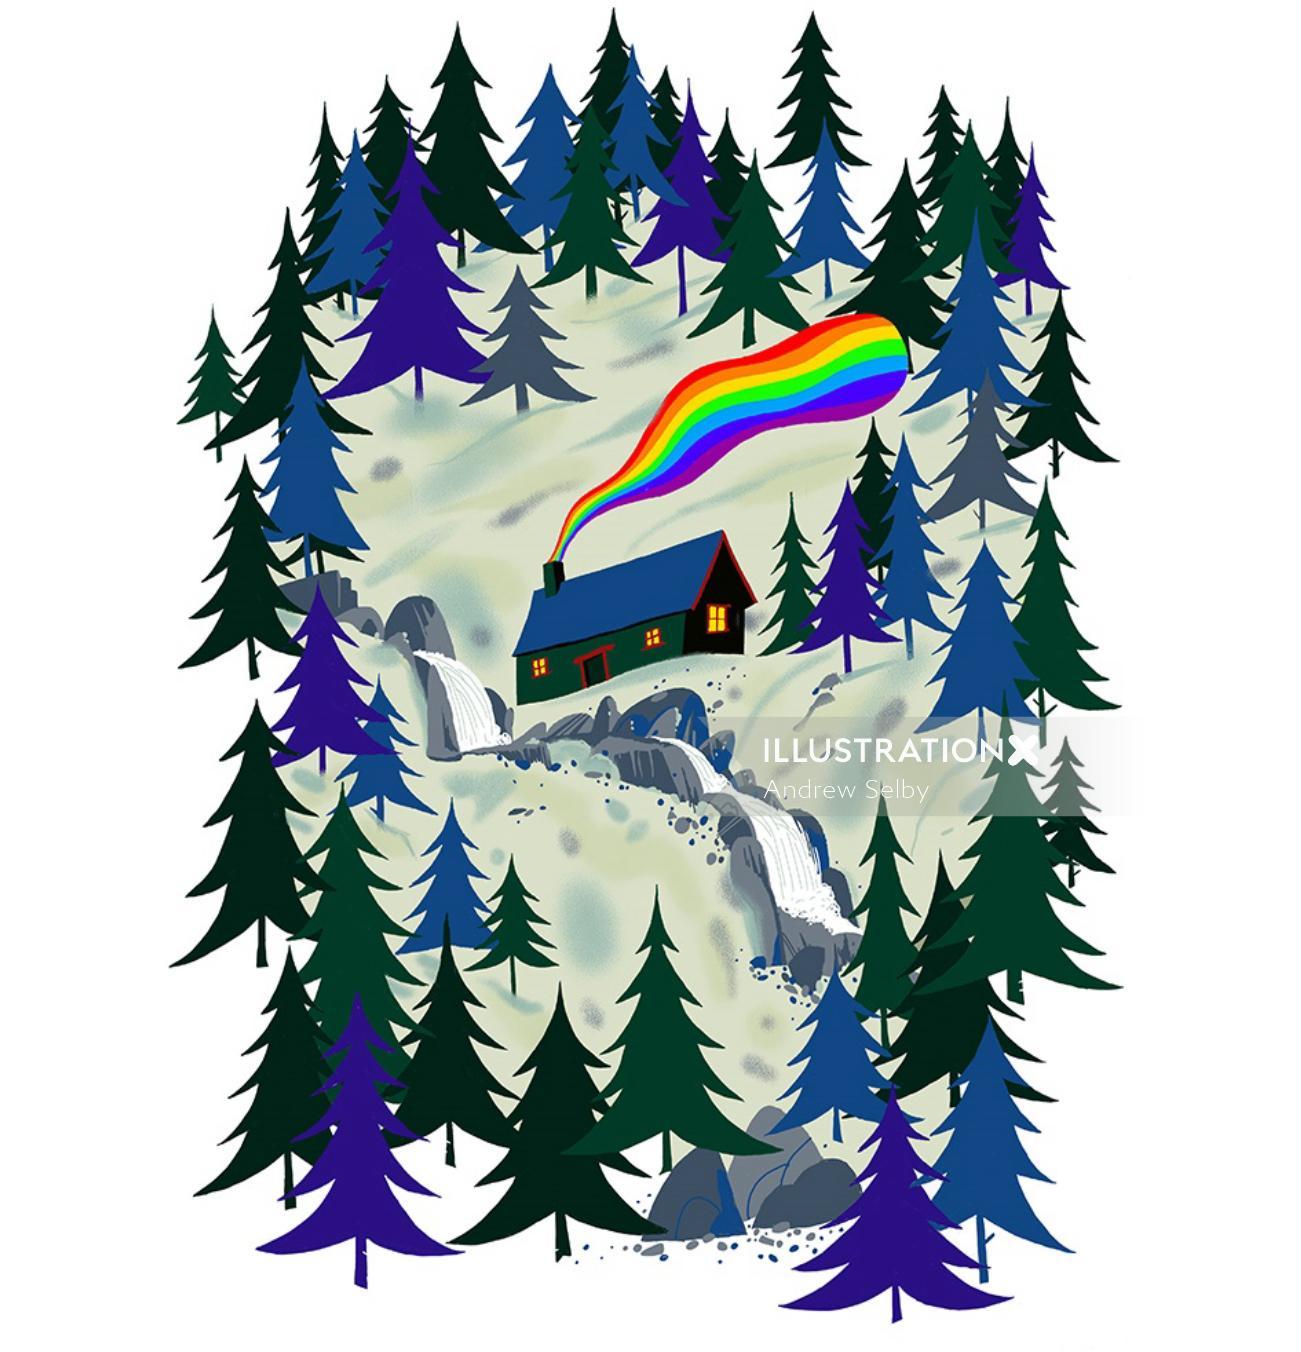 Rainbow smoke from snowy cottage